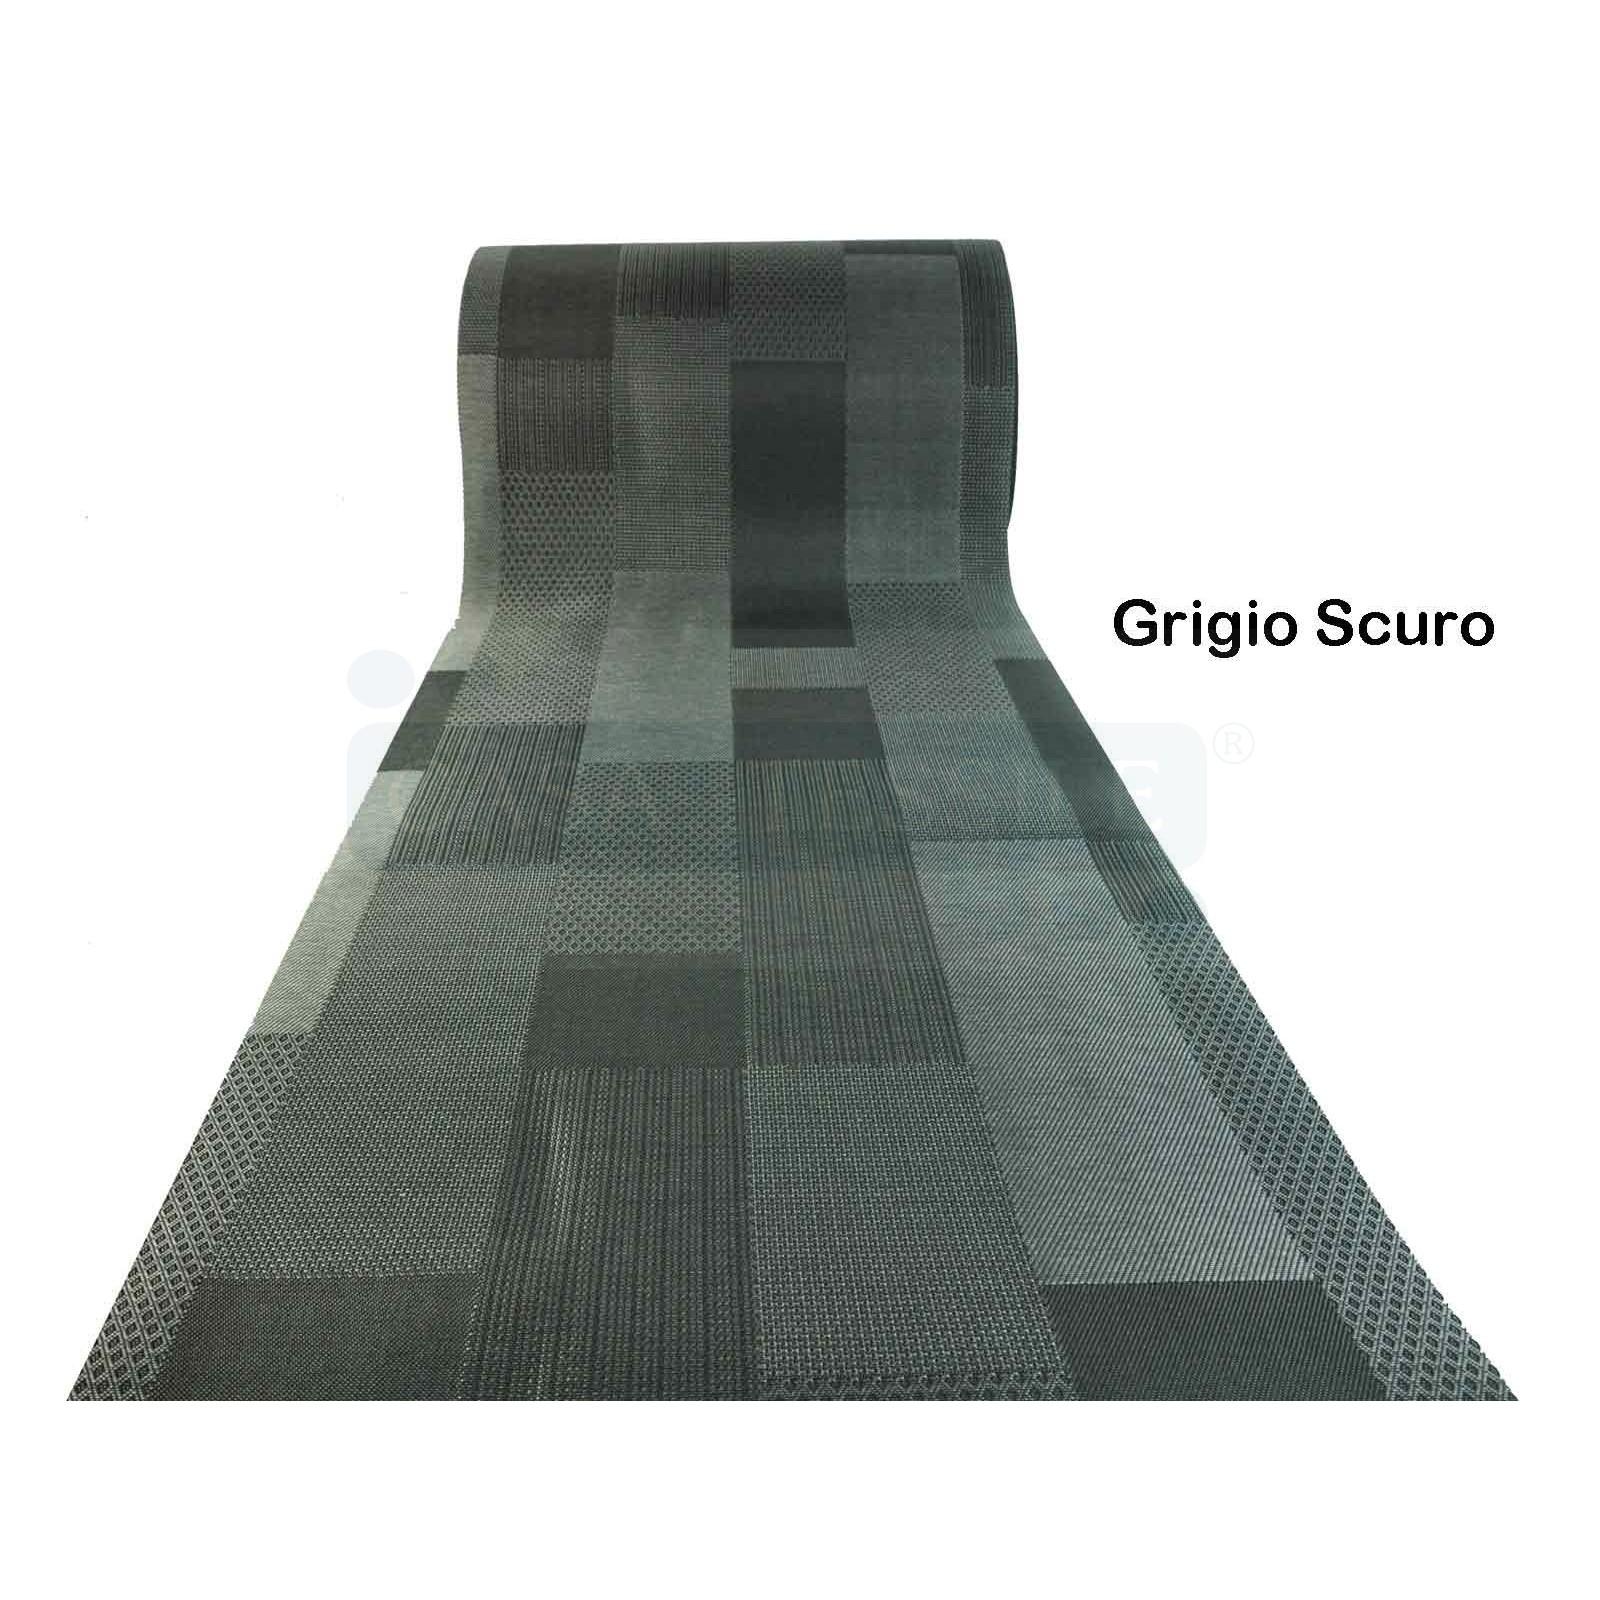 quadriland moderne vinyl und anti rutsch teppich casa. Black Bedroom Furniture Sets. Home Design Ideas